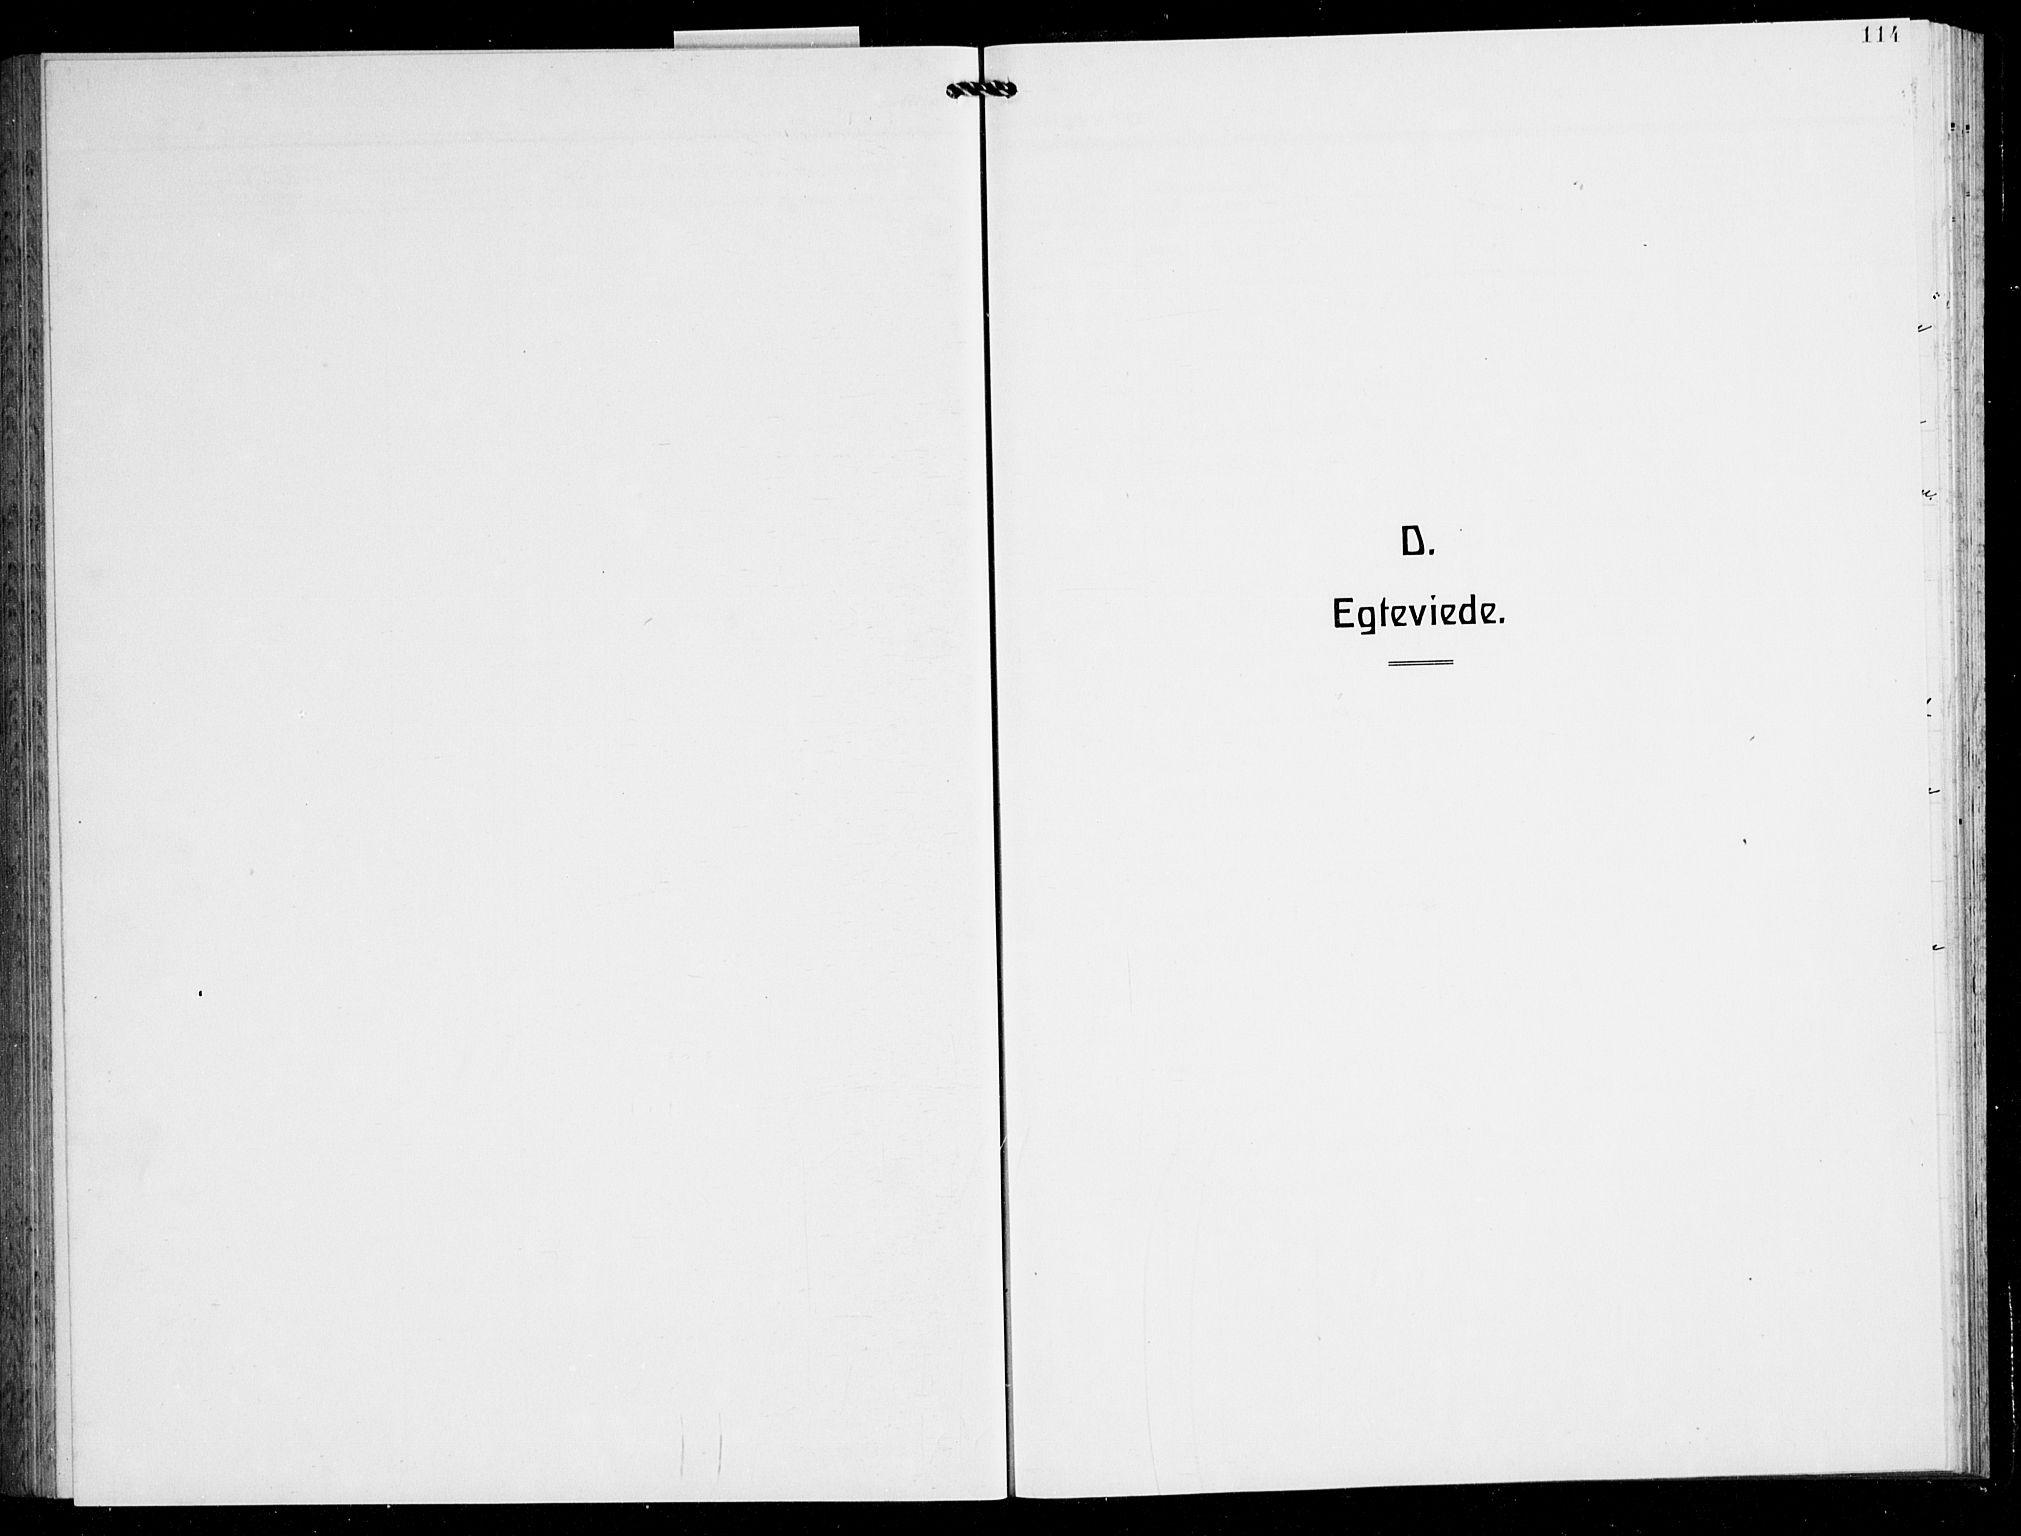 SAB, Finnås sokneprestembete, H/Ha/Hab/Haba/L0005: Klokkerbok nr. A 5, 1924-1945, s. 114